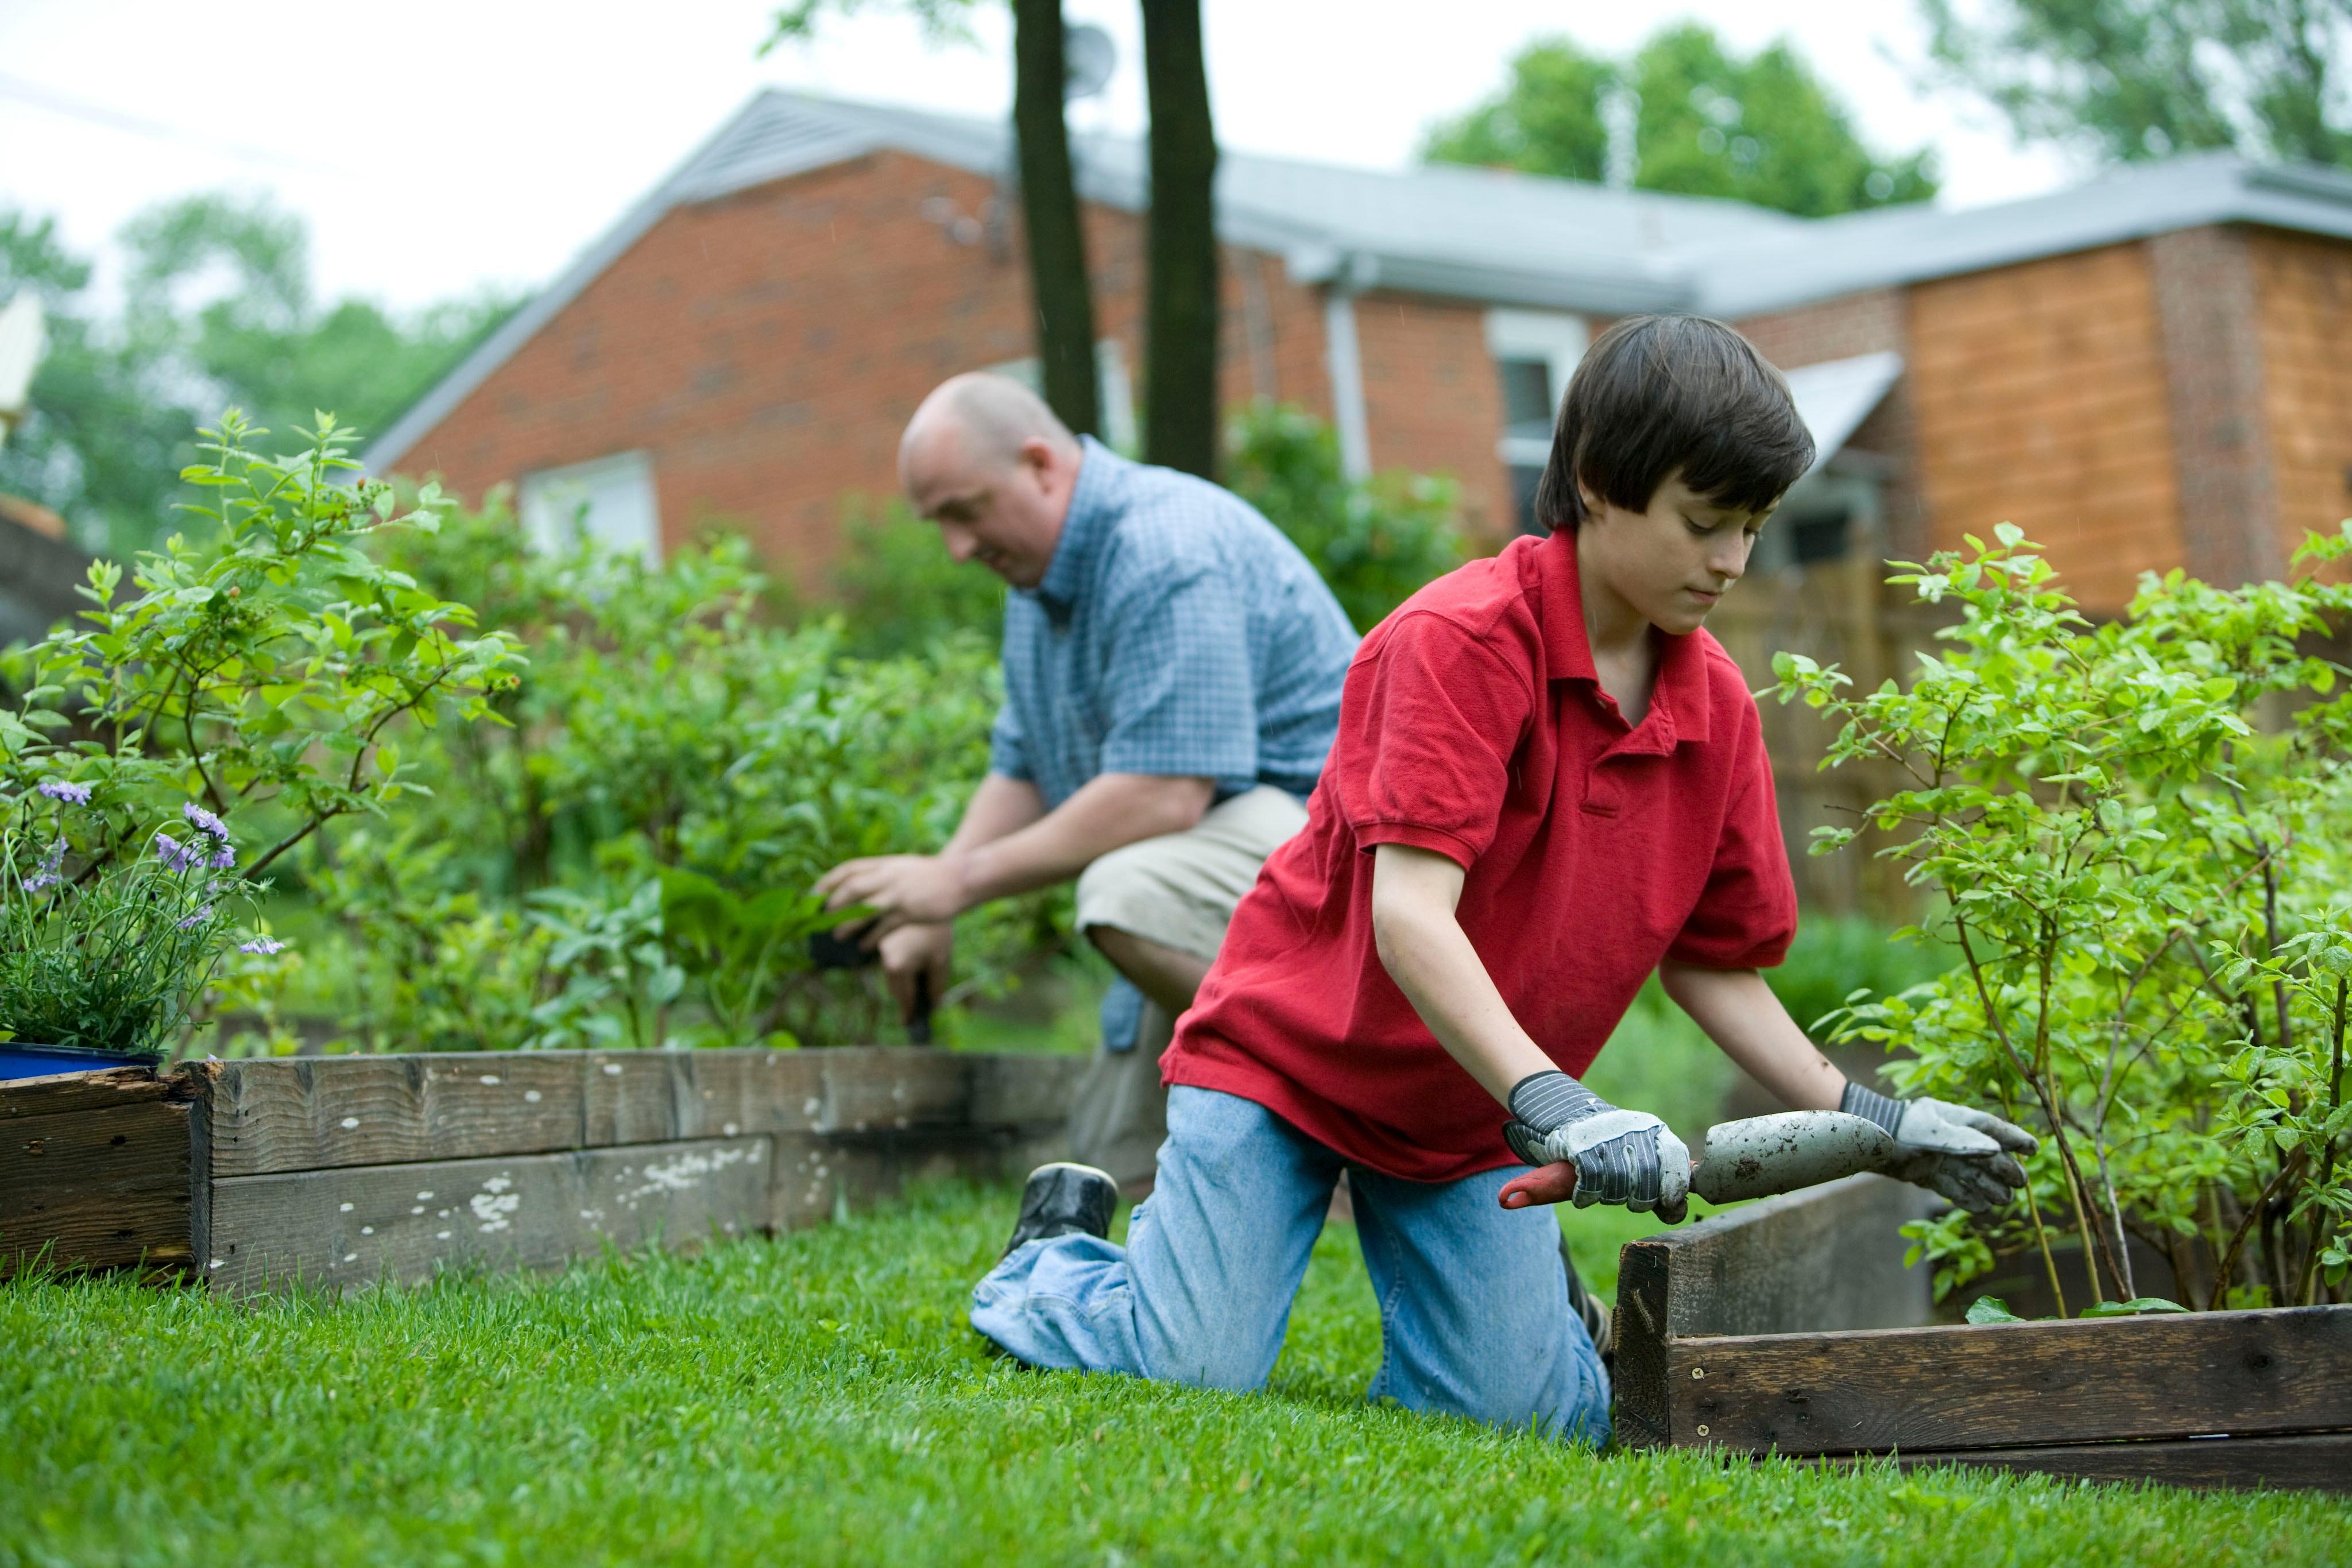 Community Gardening Stress and Wellbeing - Community Gardening